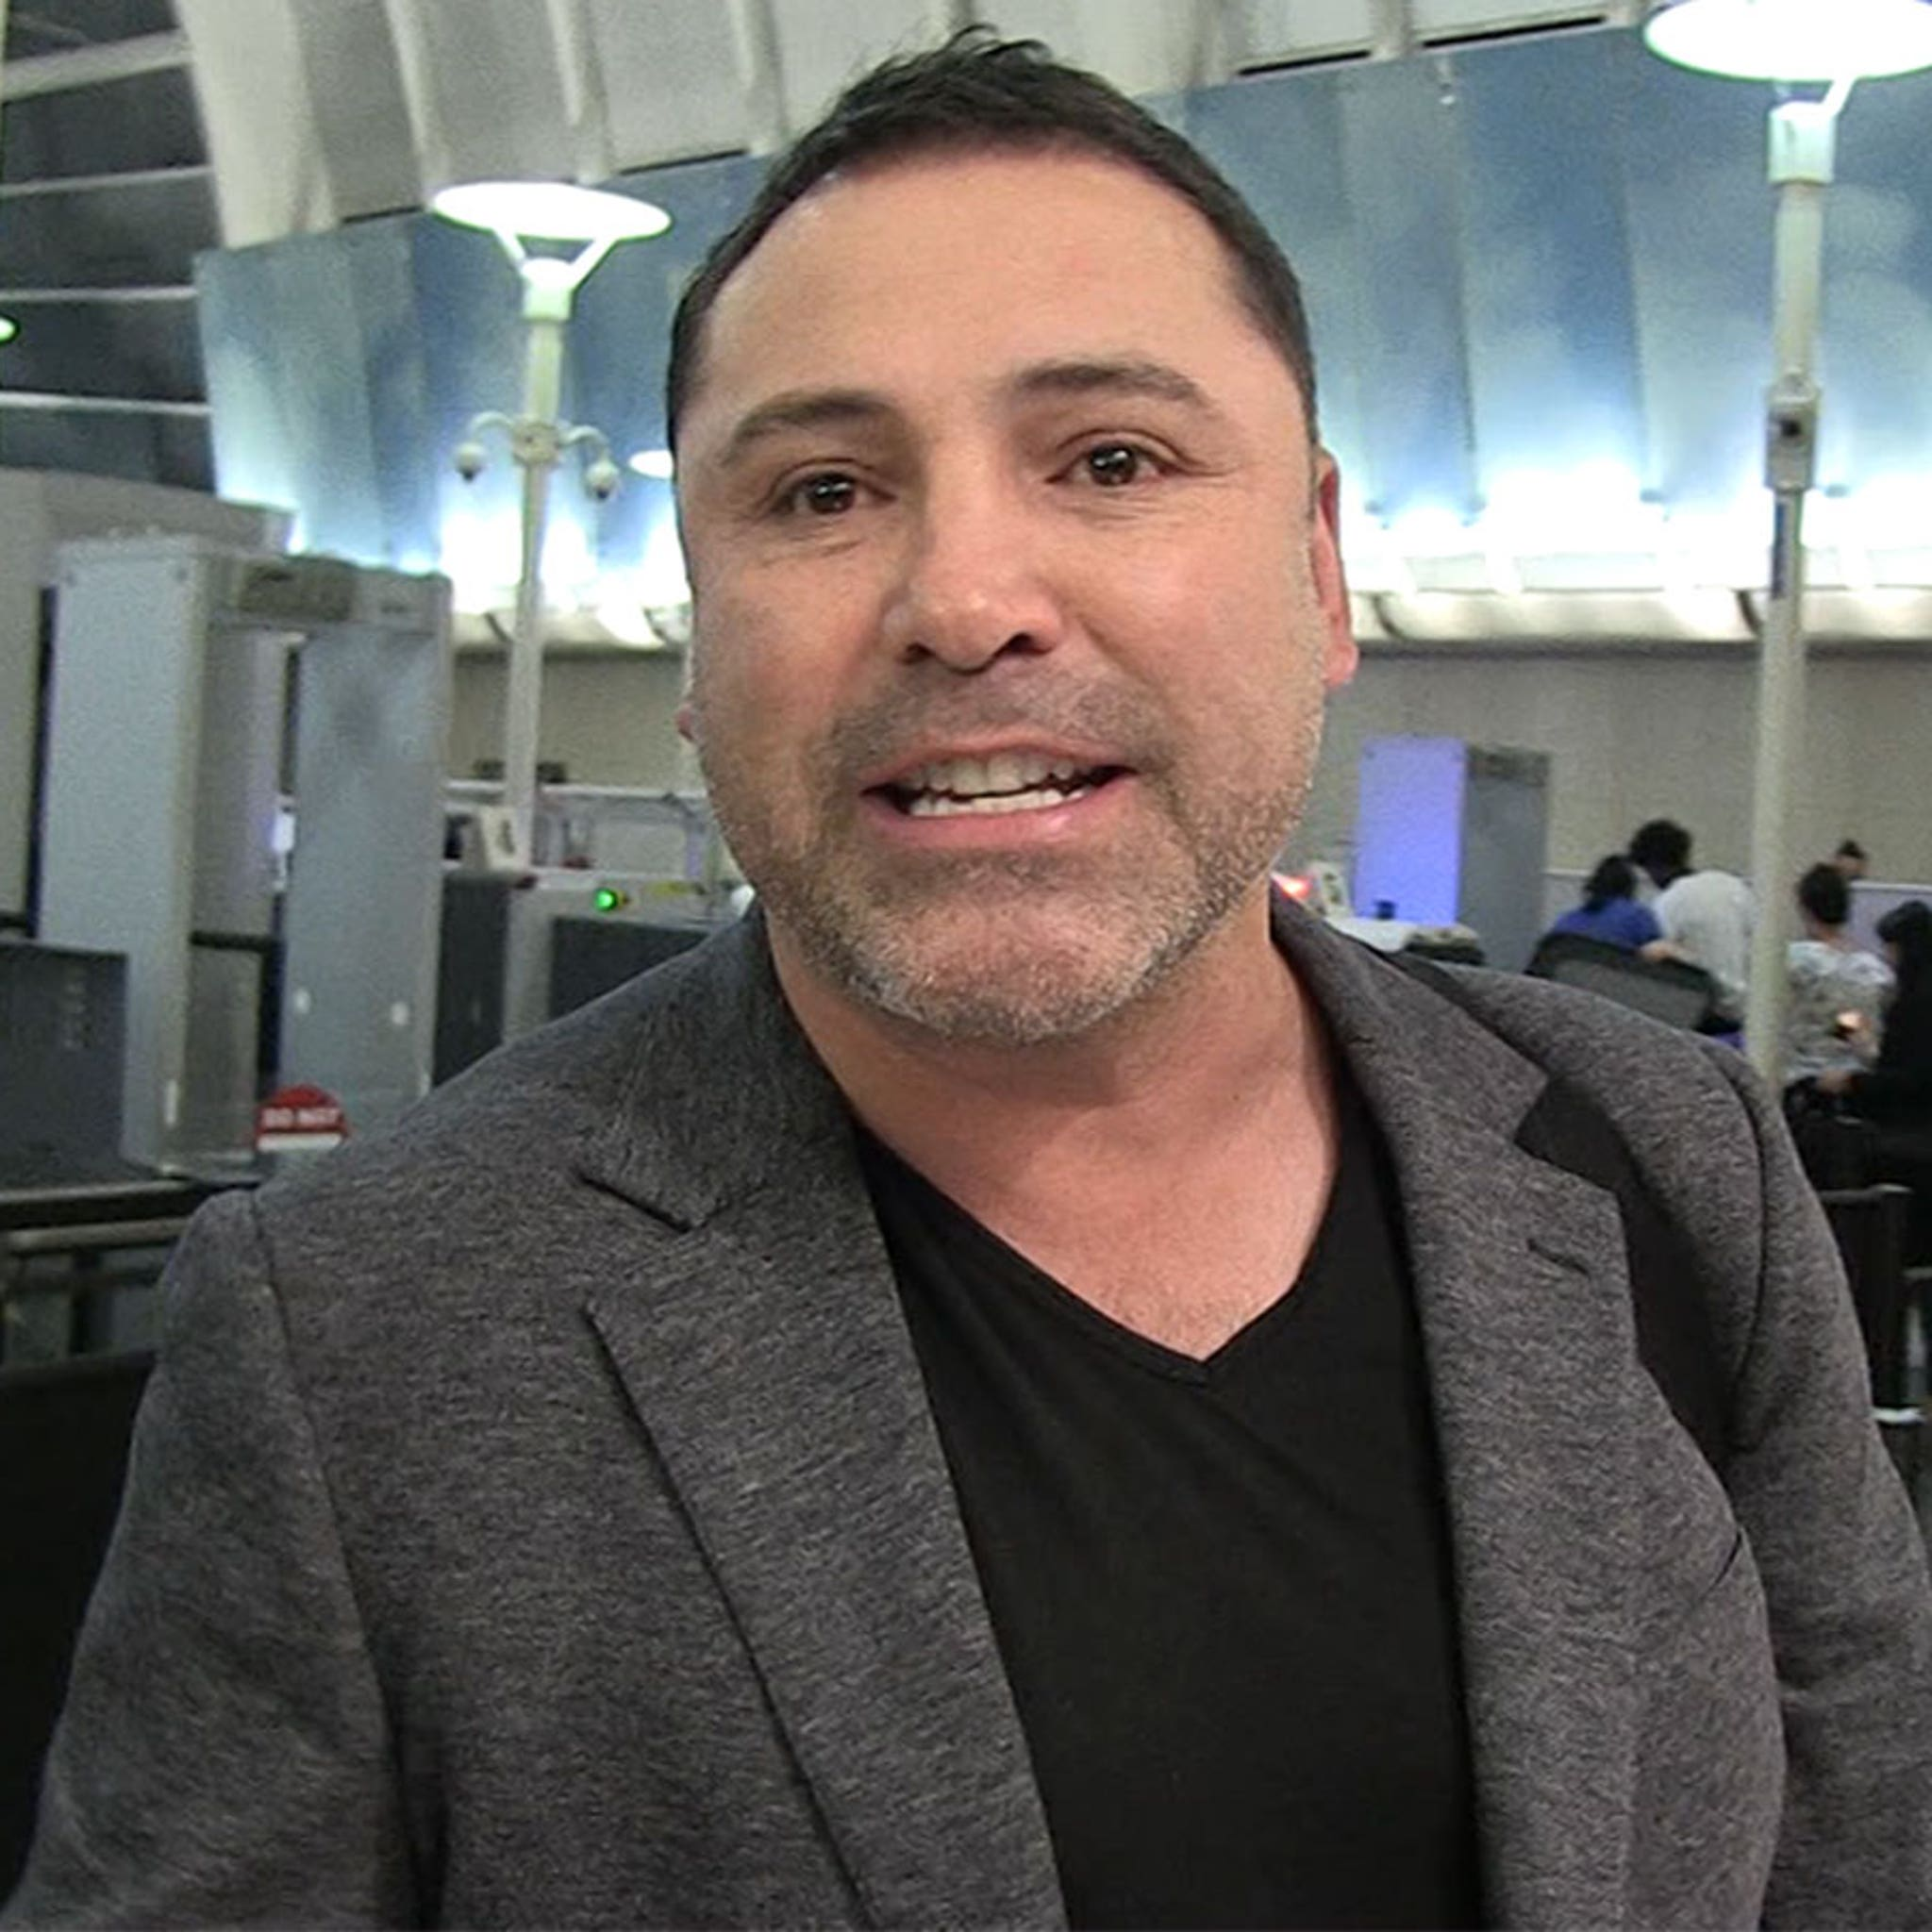 Oscar De La Hoya Denies Abusing Staffer While Intoxicated, 'It's All Frivolous'